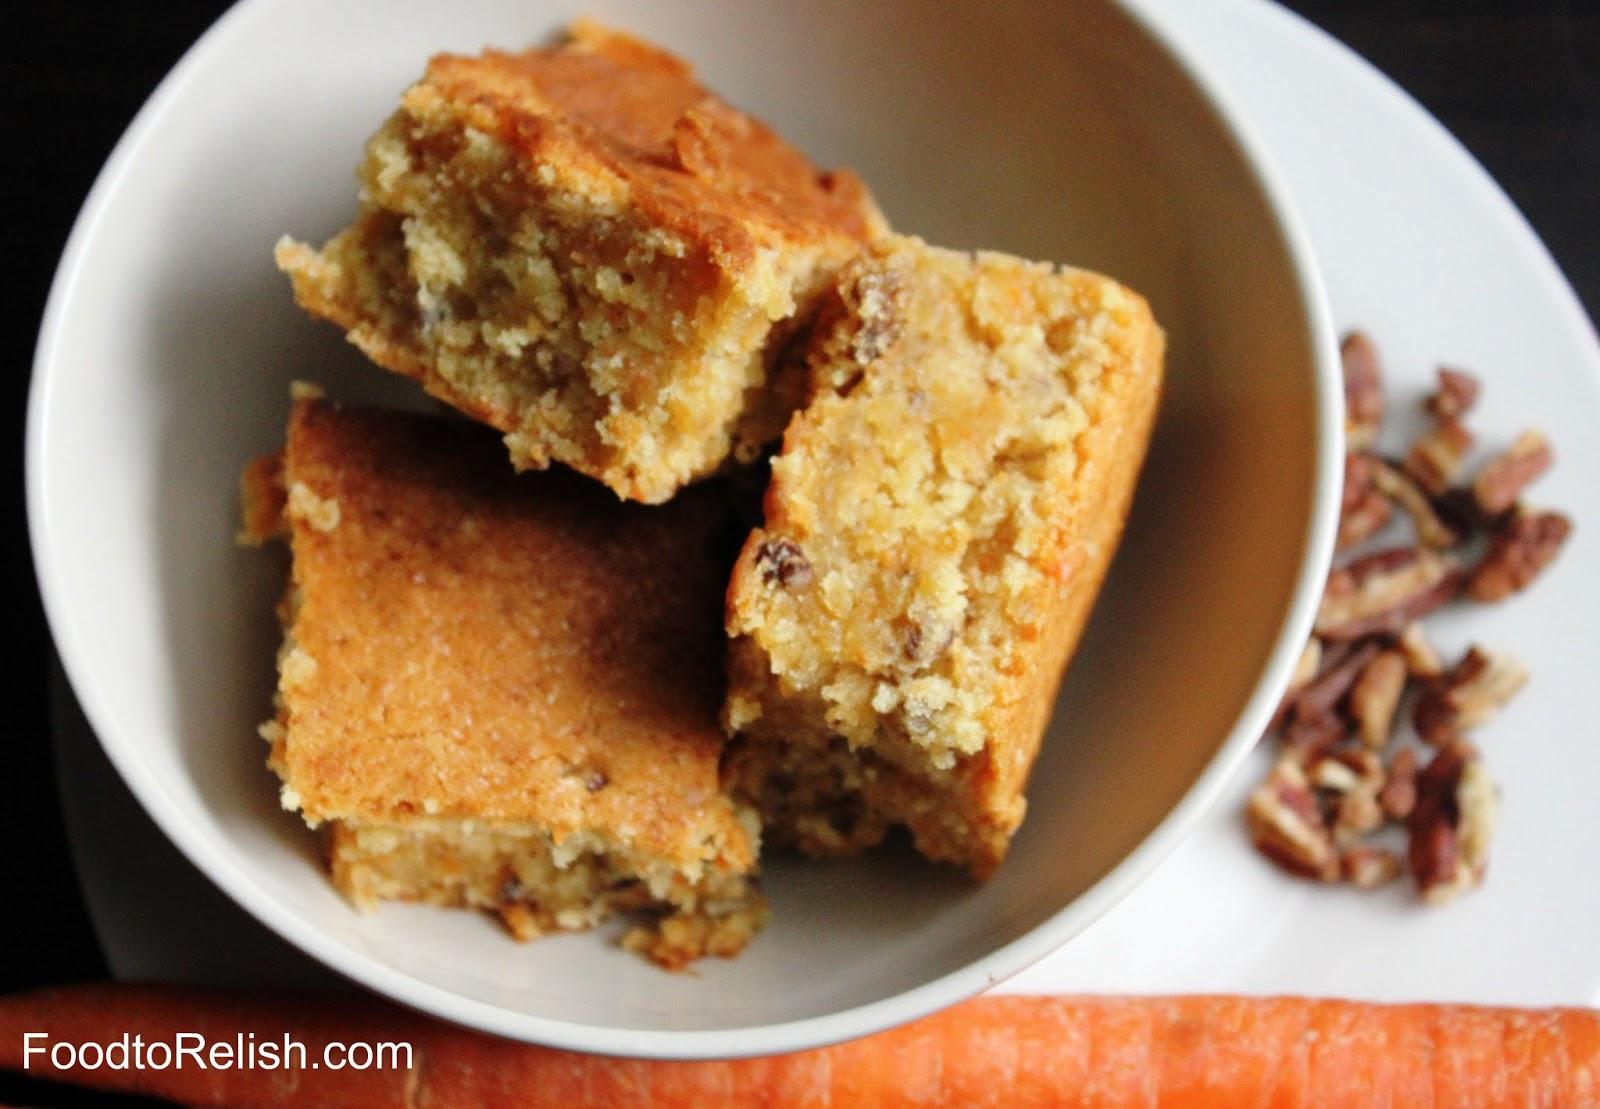 Carrot Pecan Cake (Eggless) | Food to Relish